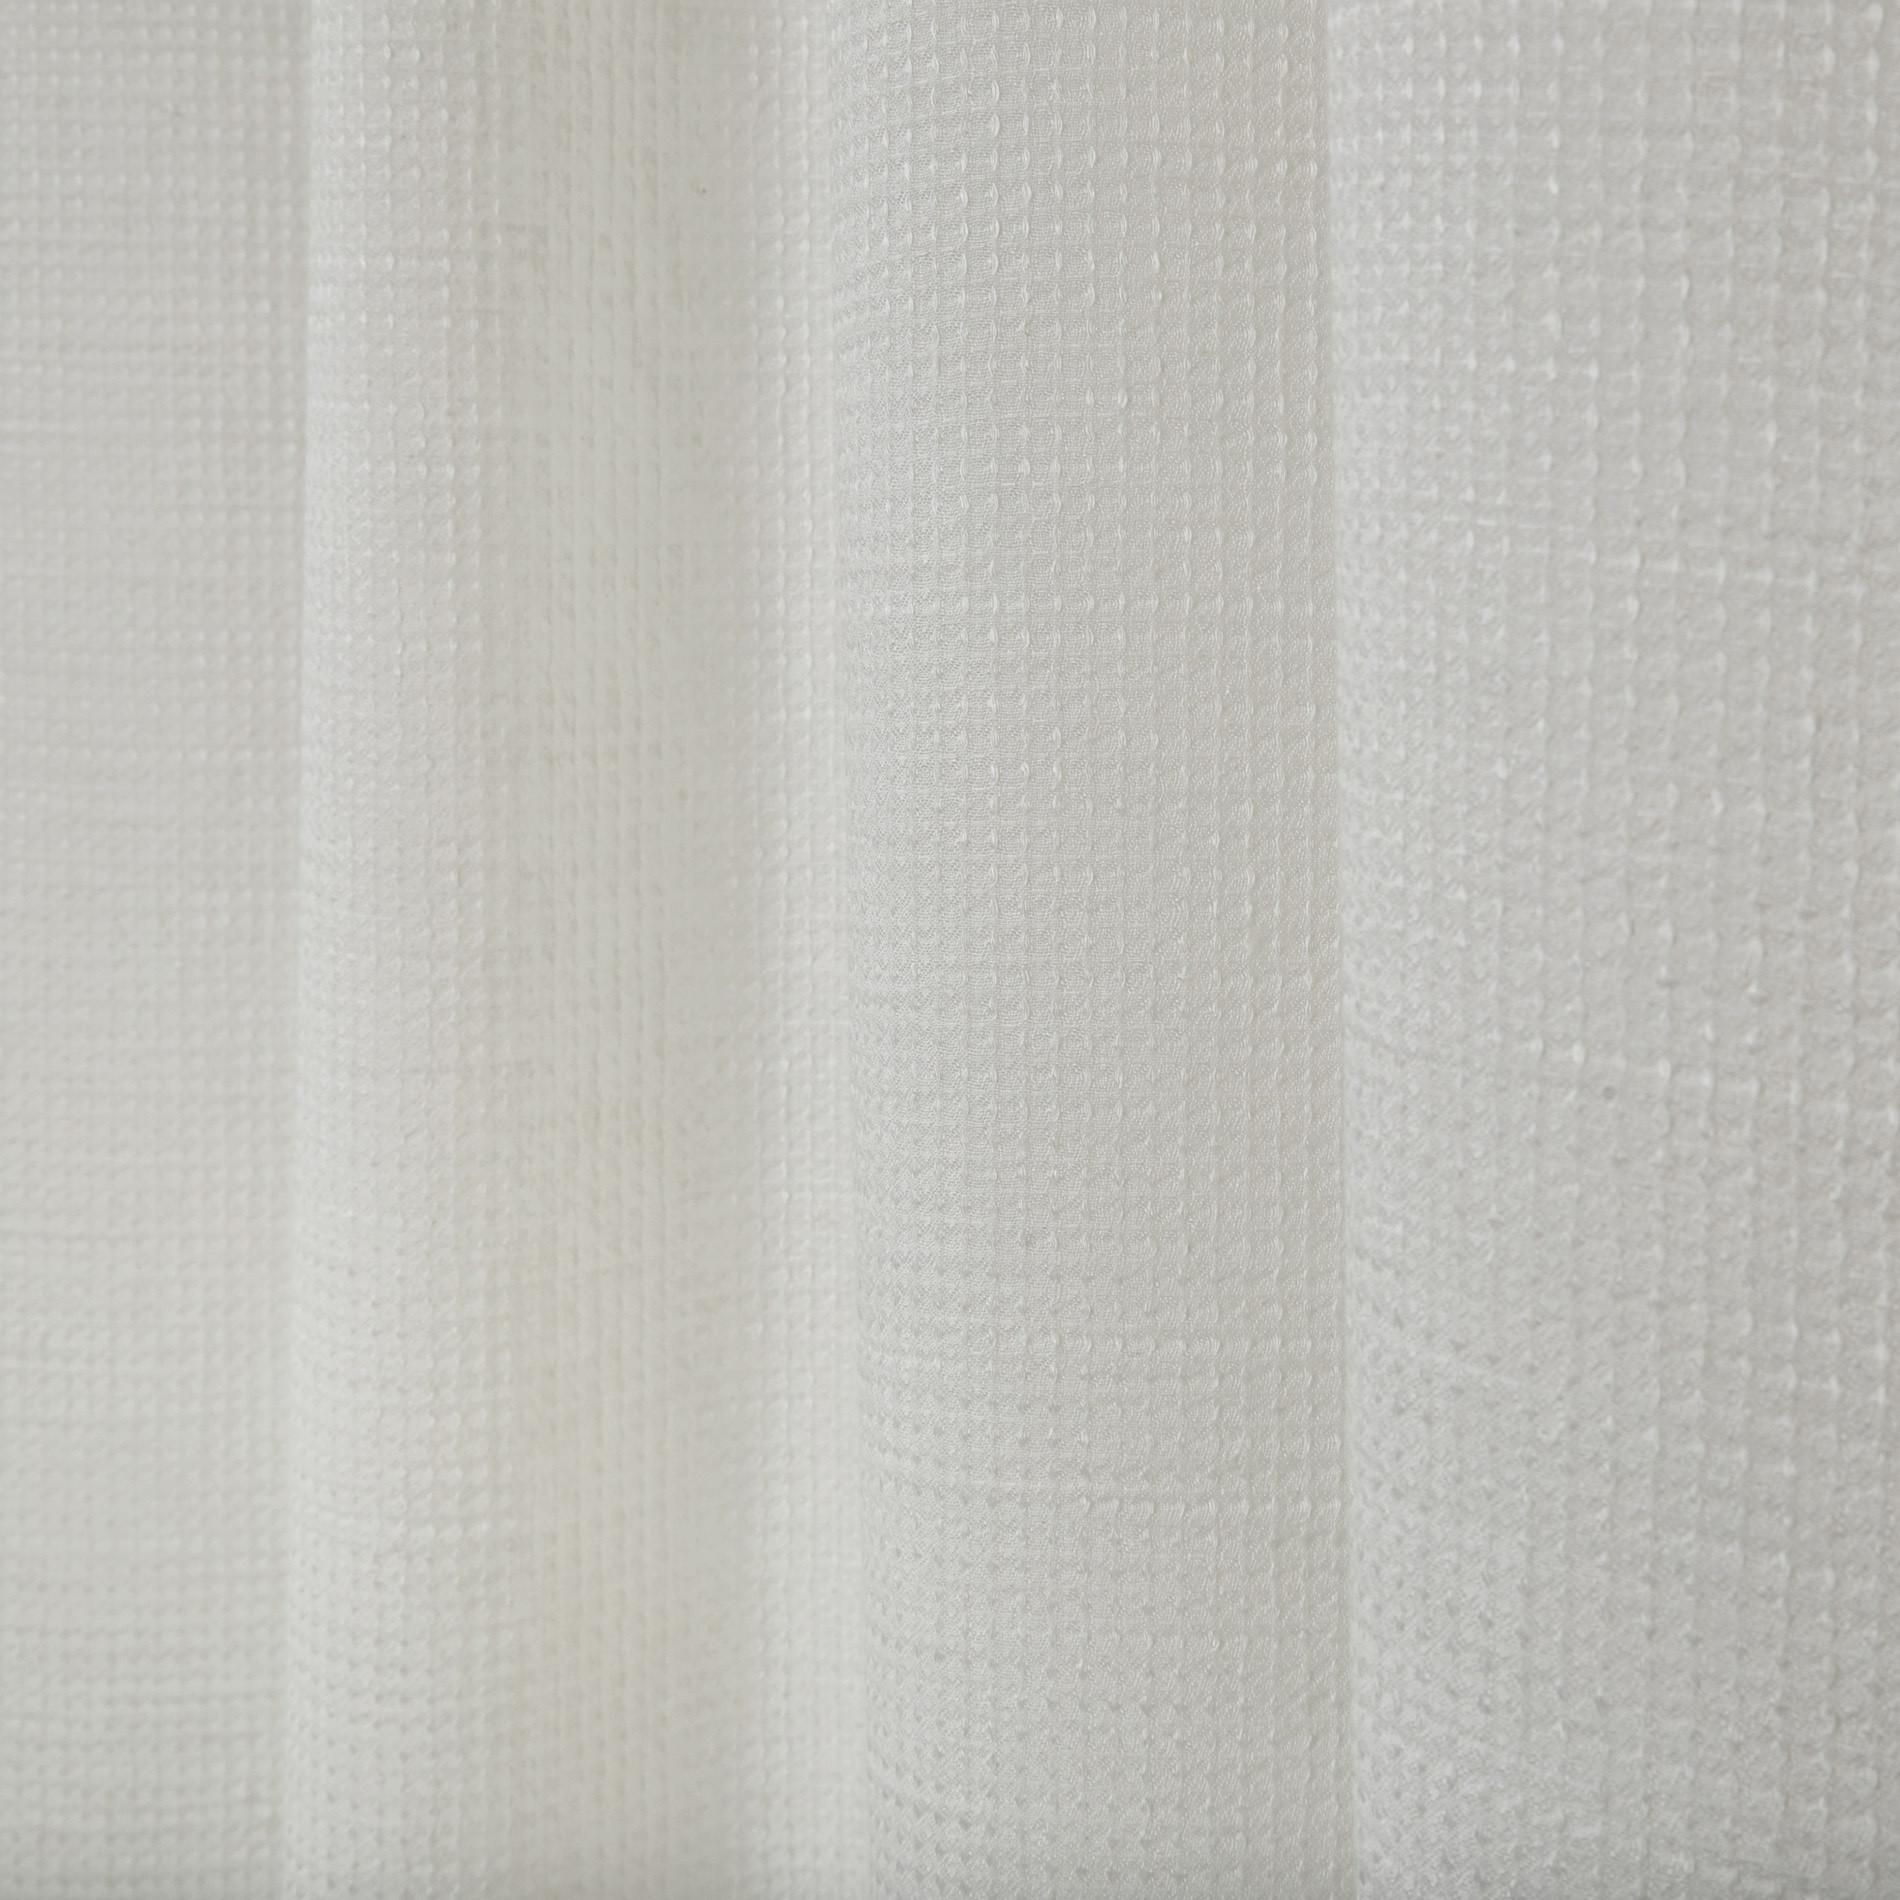 Tenda misto lino passanti nascosti, Bianco, large image number 0